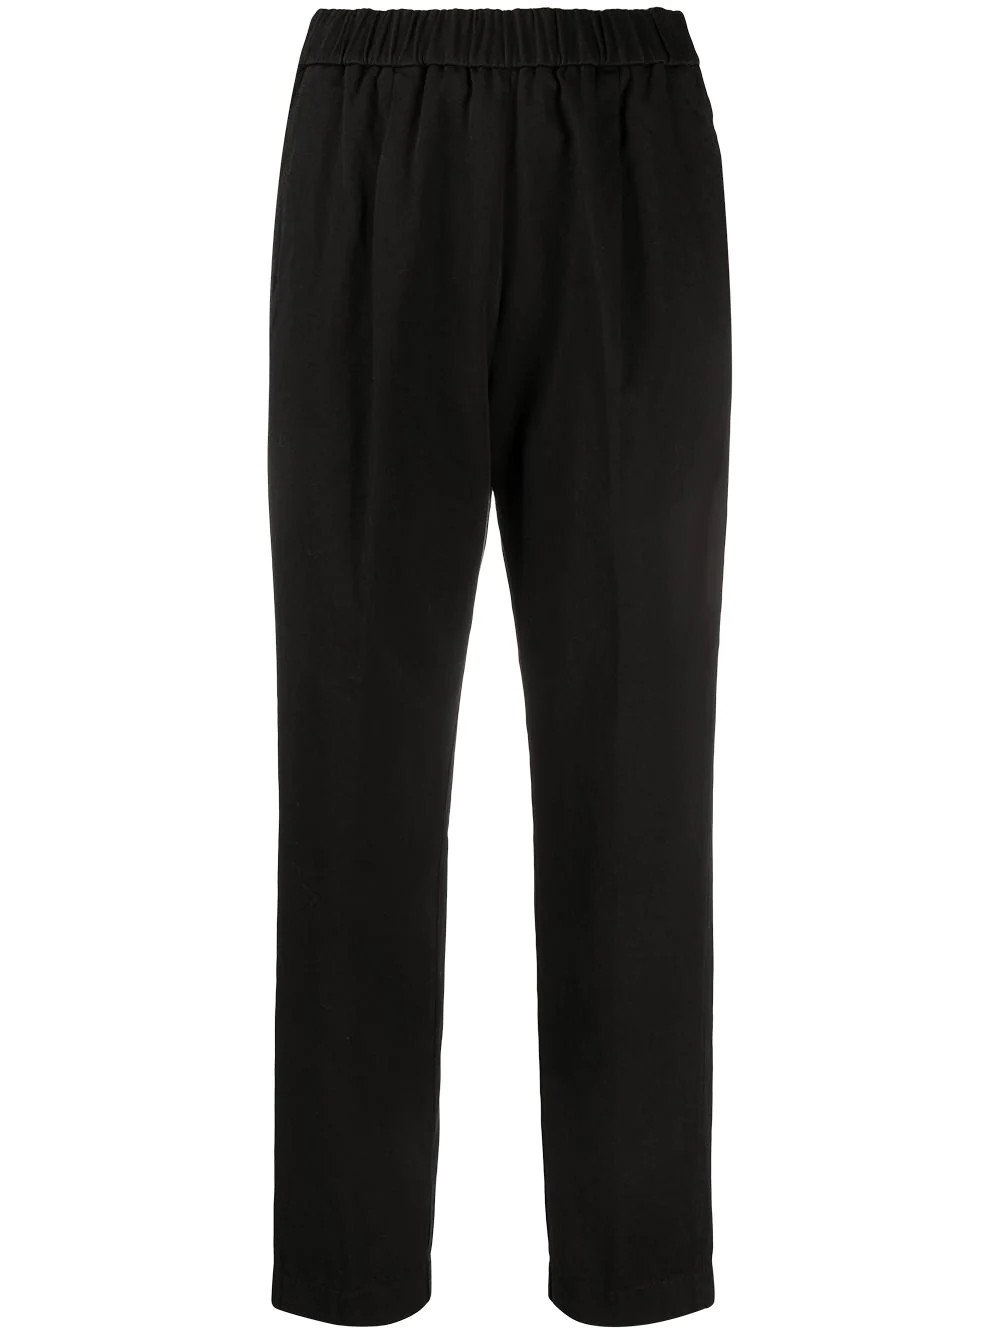 pantalone elastico gabardina cotone